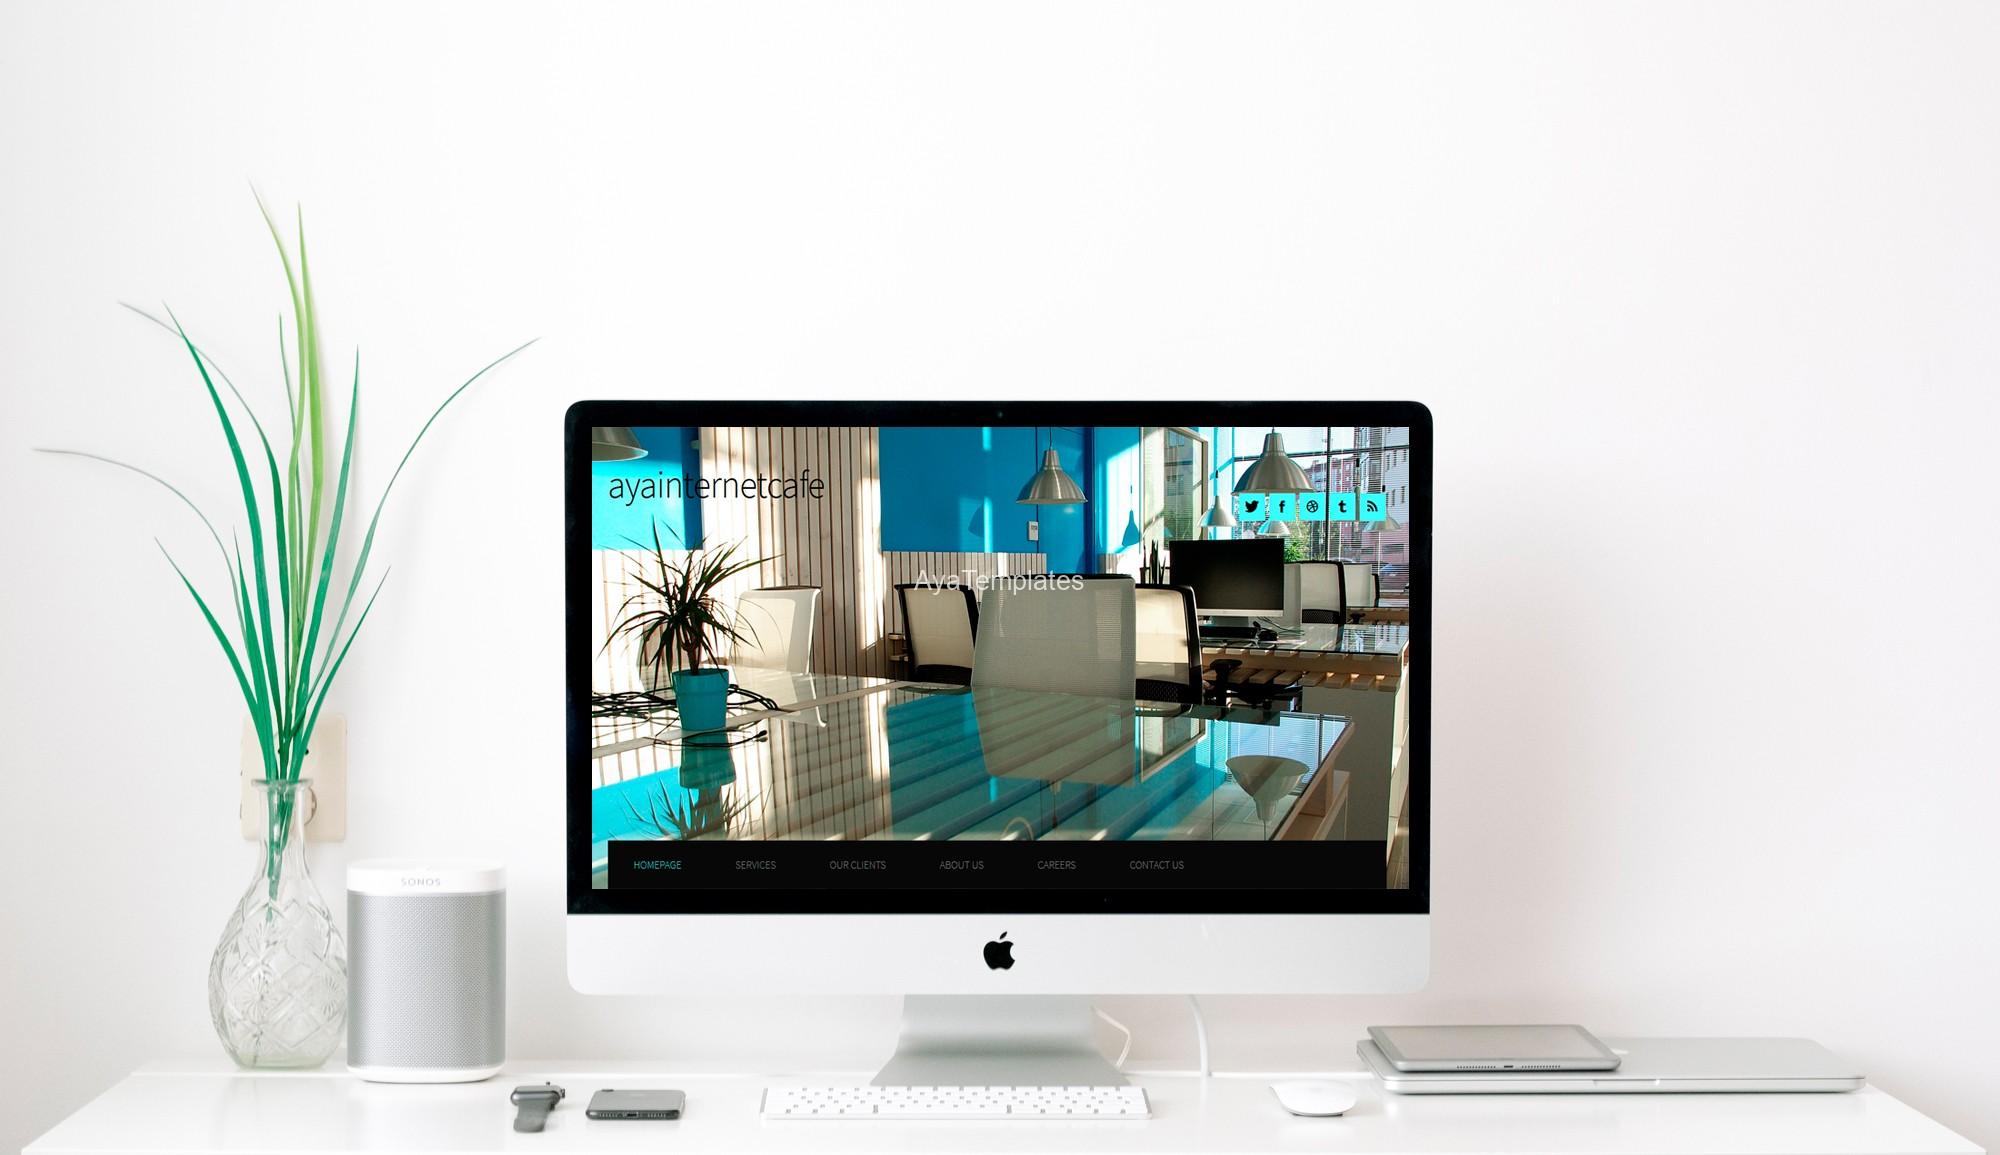 html-css-template-screen-mockup-Css-designed-site-AyaInternetCafe